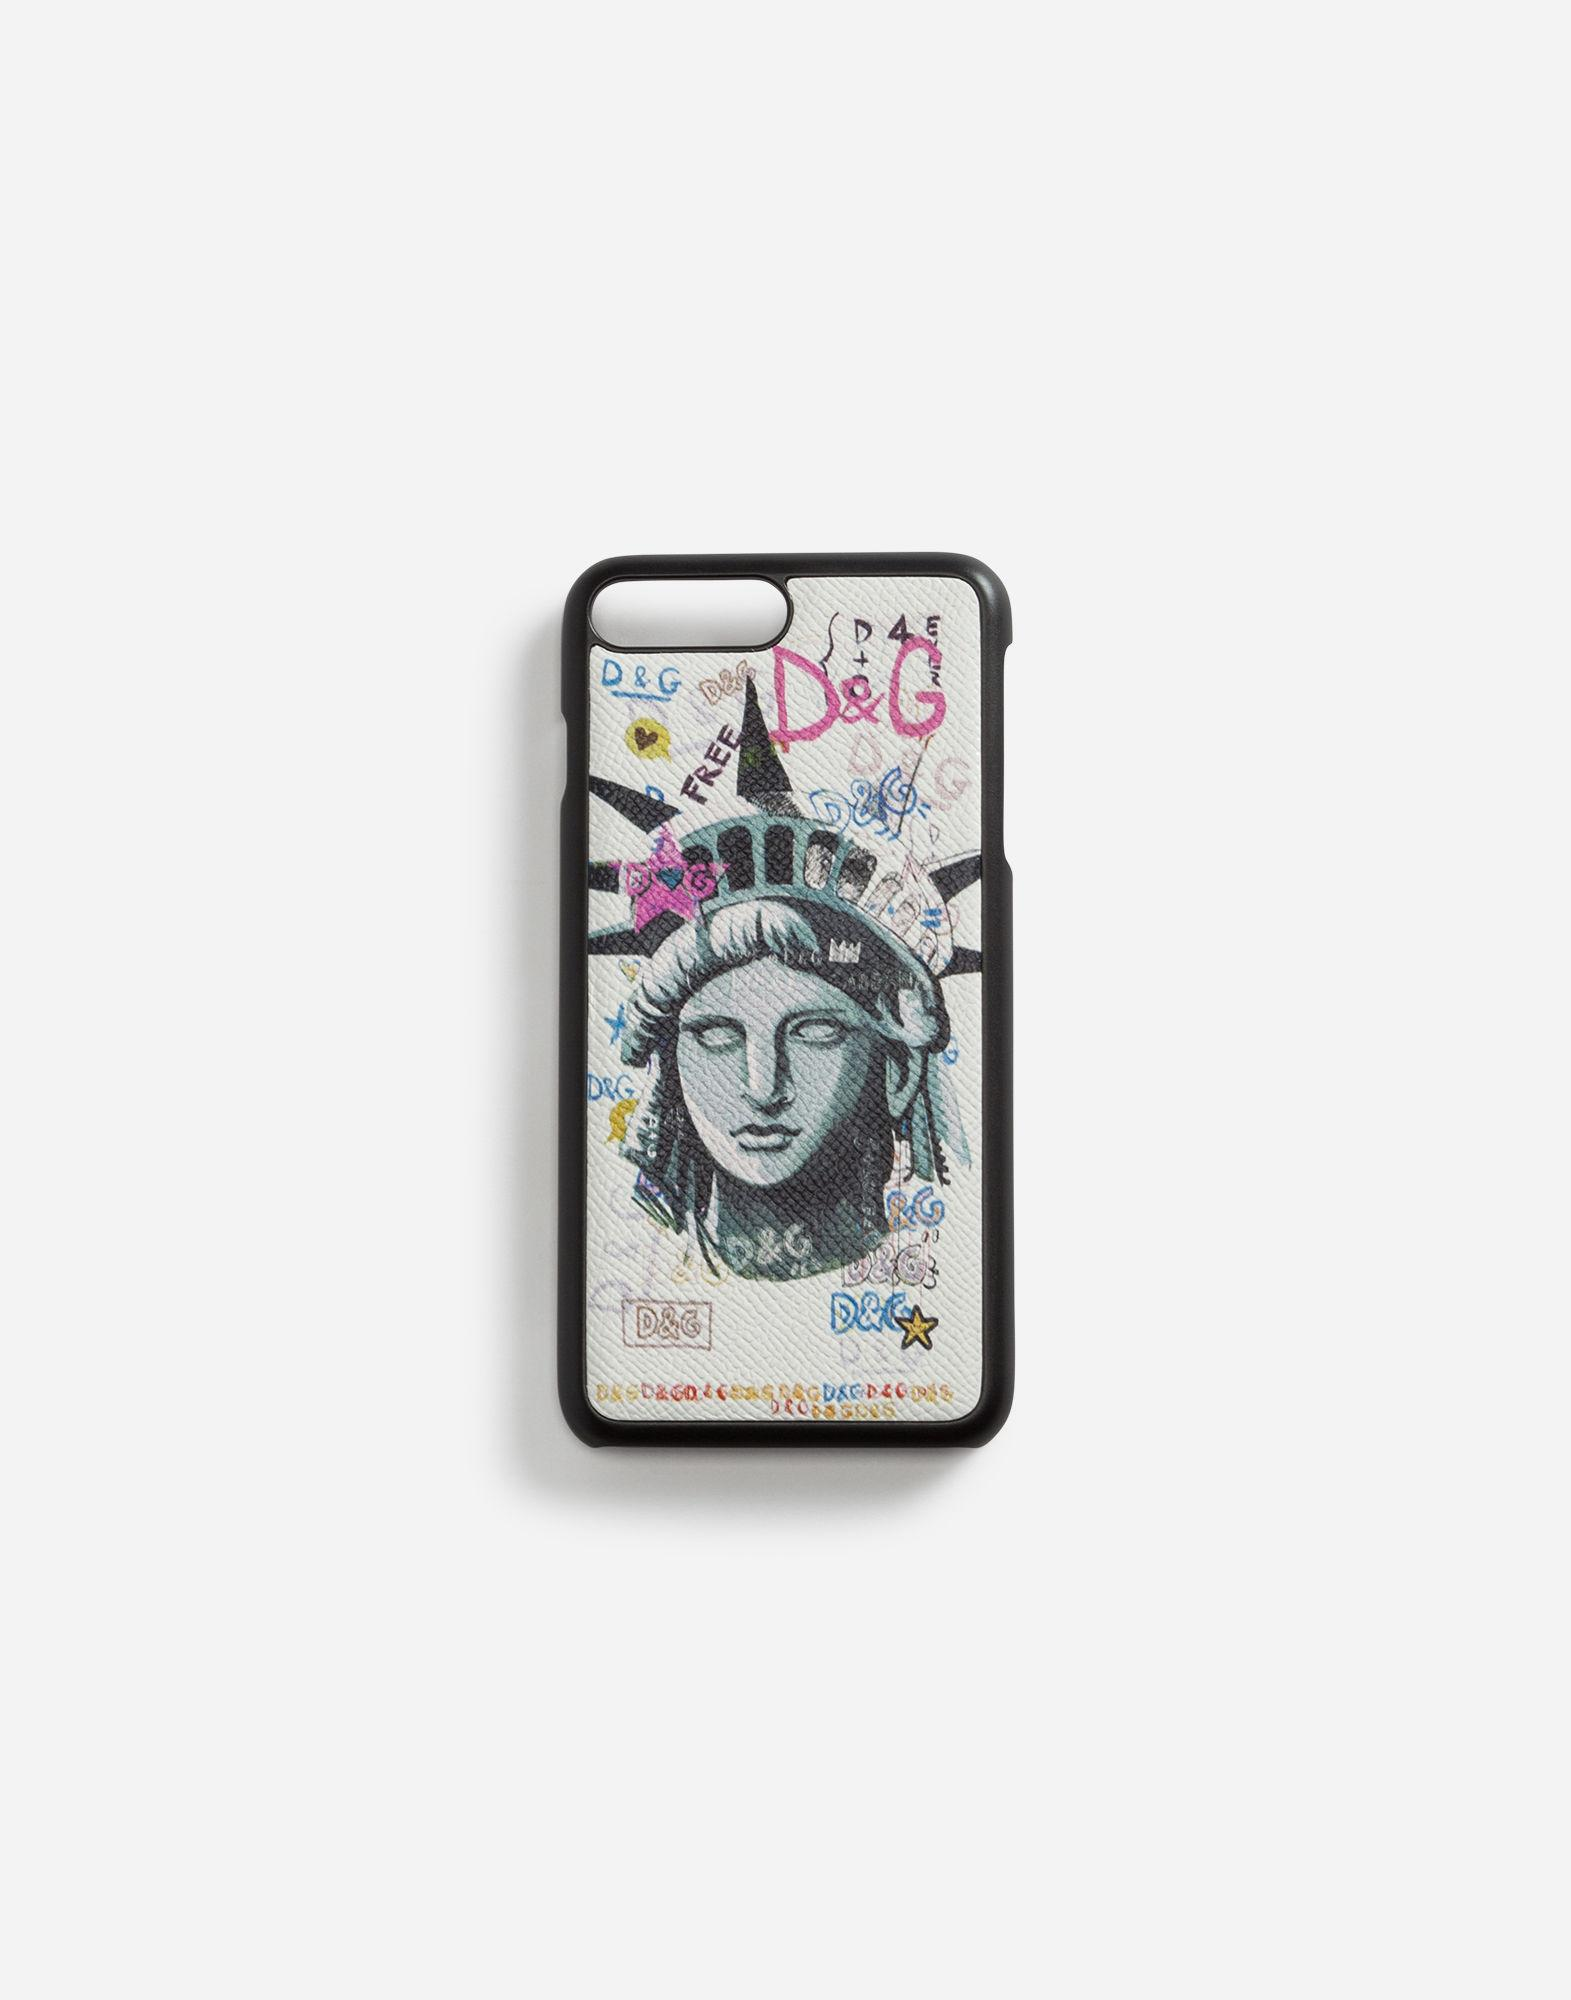 Dolce & Gabbana Iphone 7 Plus Cover In Printed Dauphine Calfskin In Multi-colored